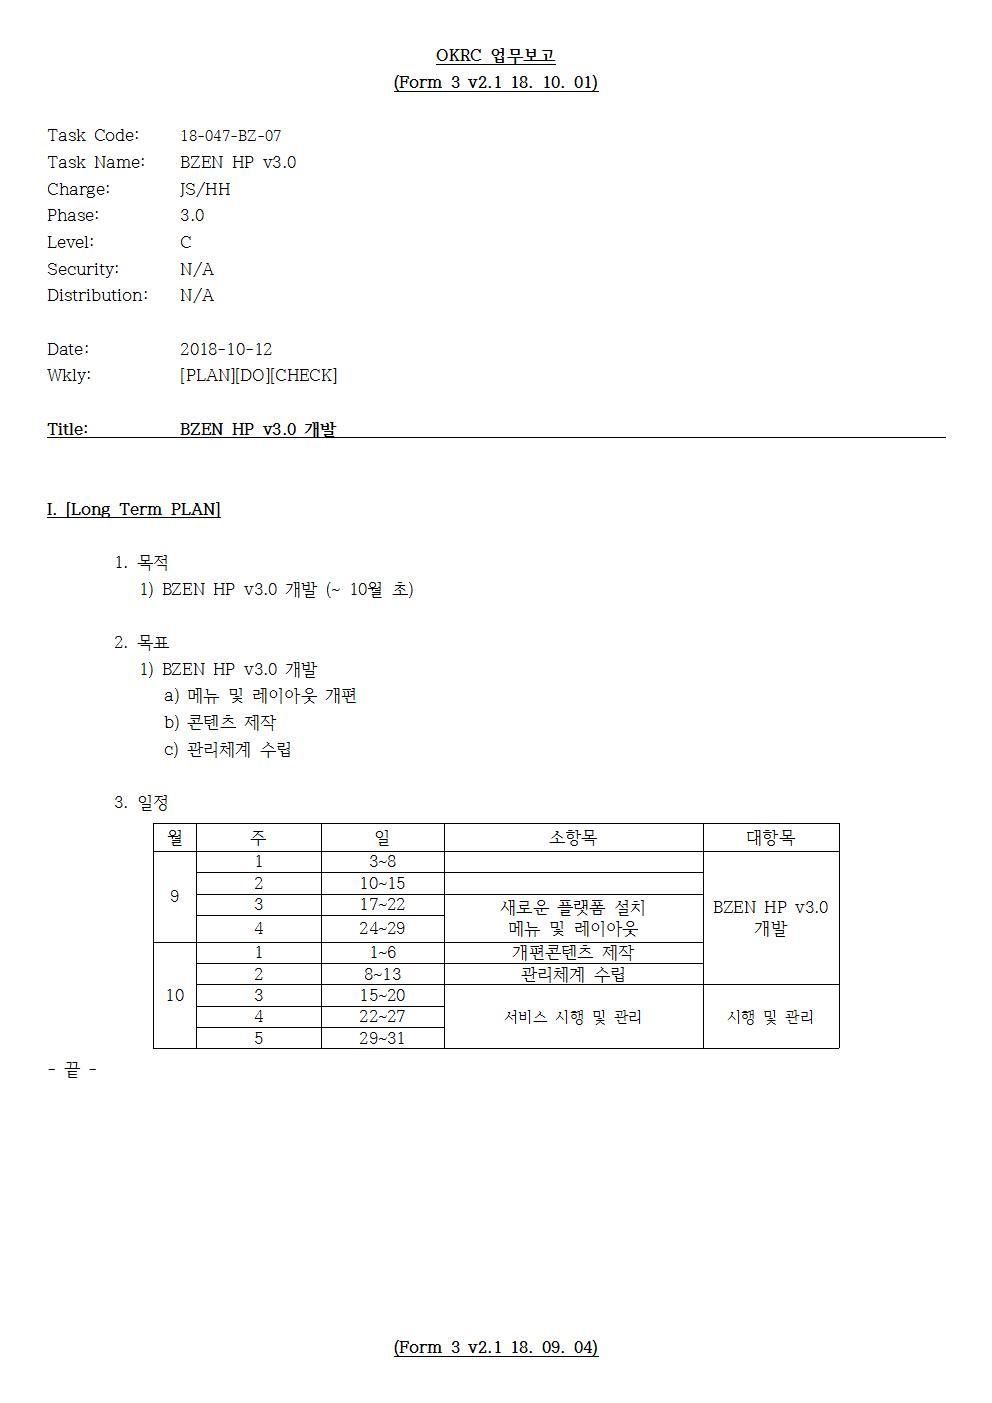 D-[18-047-BZ-07]-[BZEN HP v3.0]-[2018-10-12][HH]001.jpg